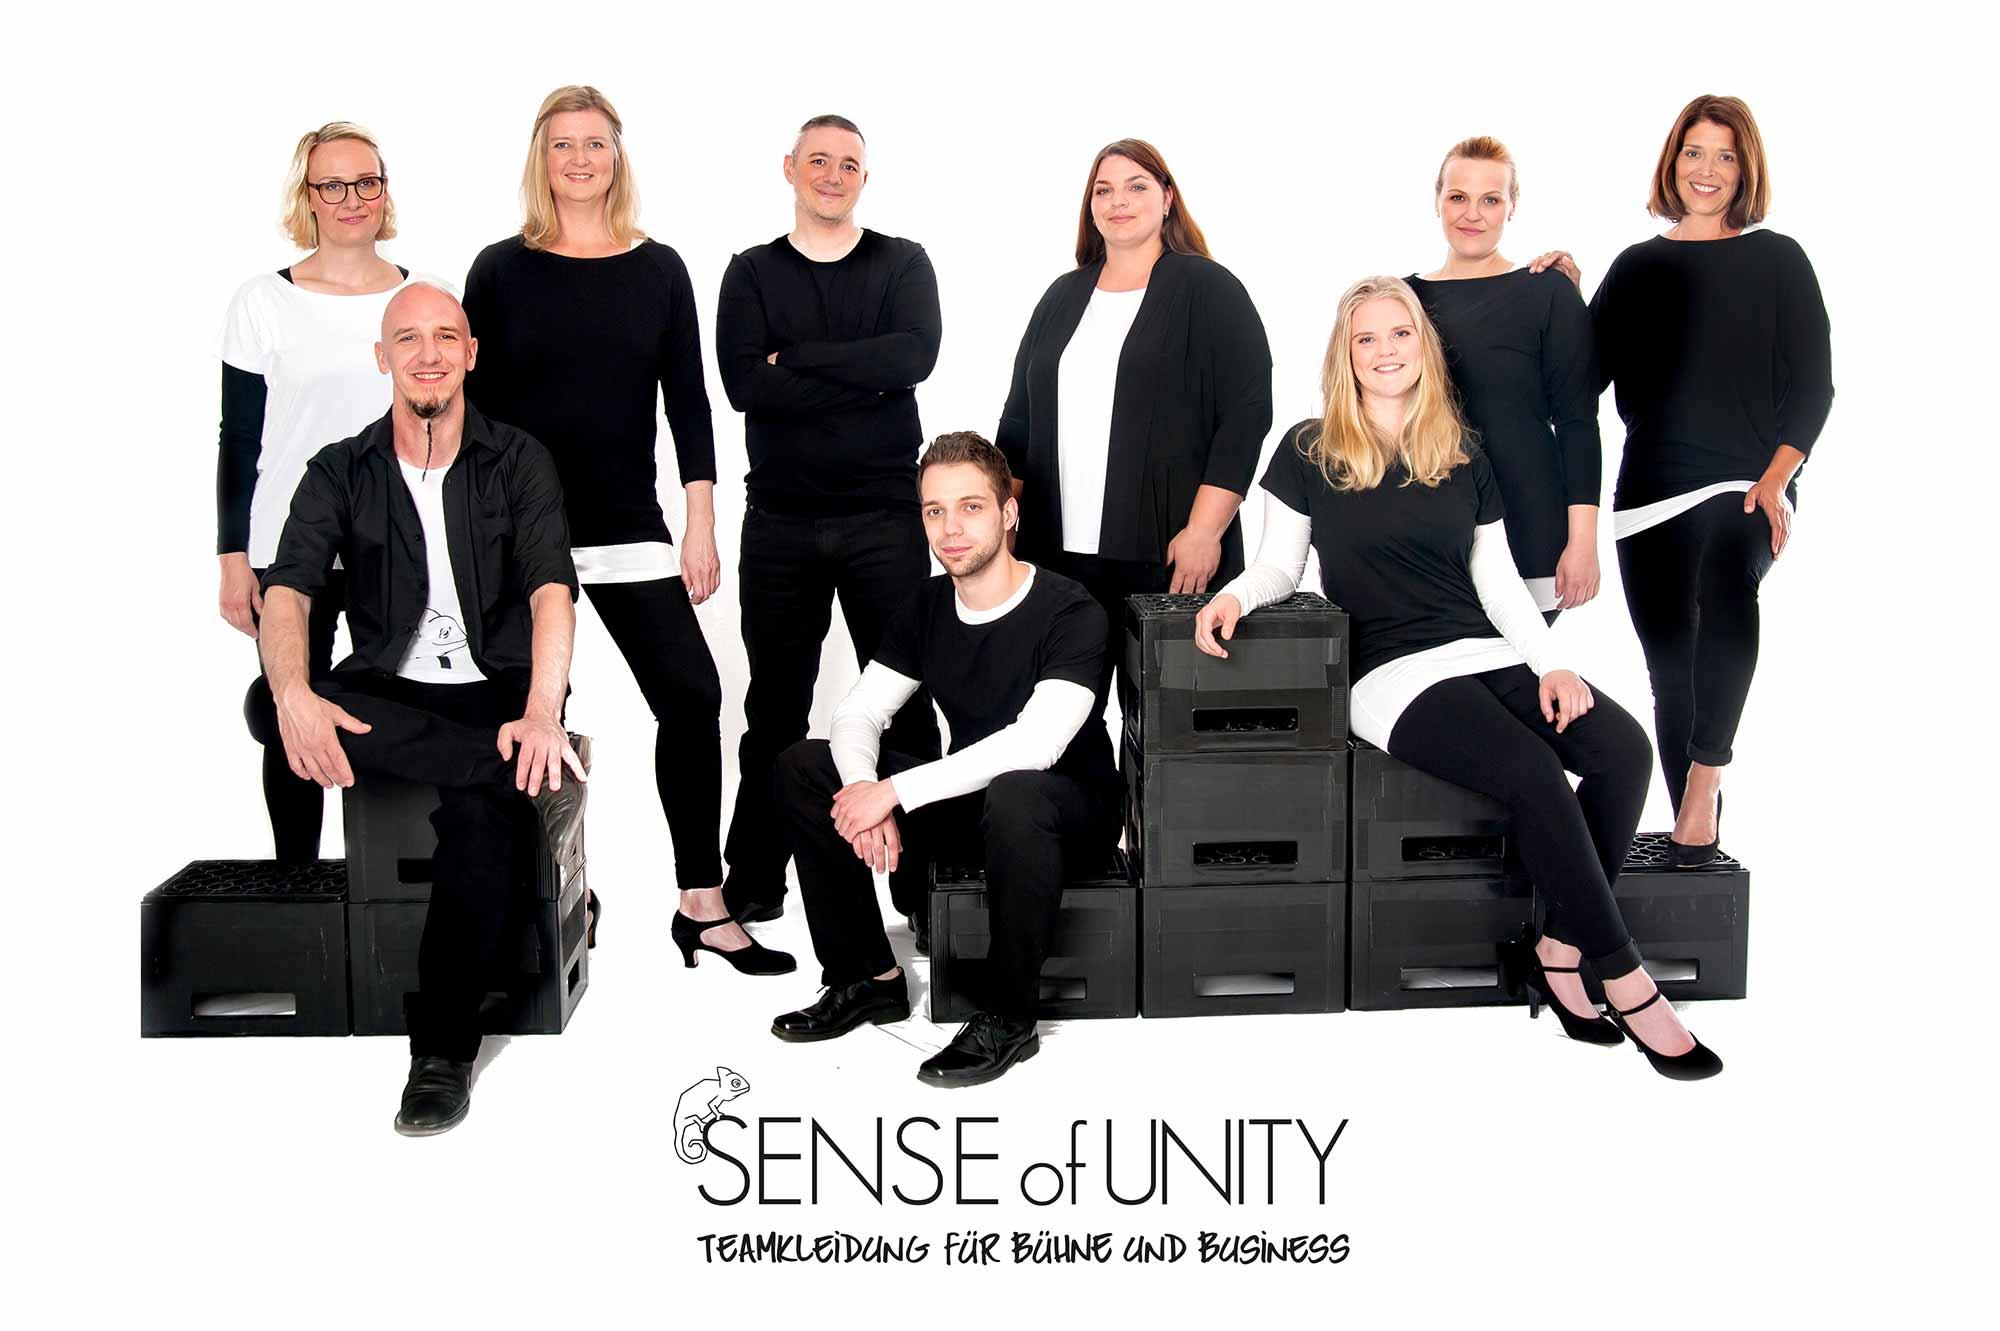 Sense of Unity